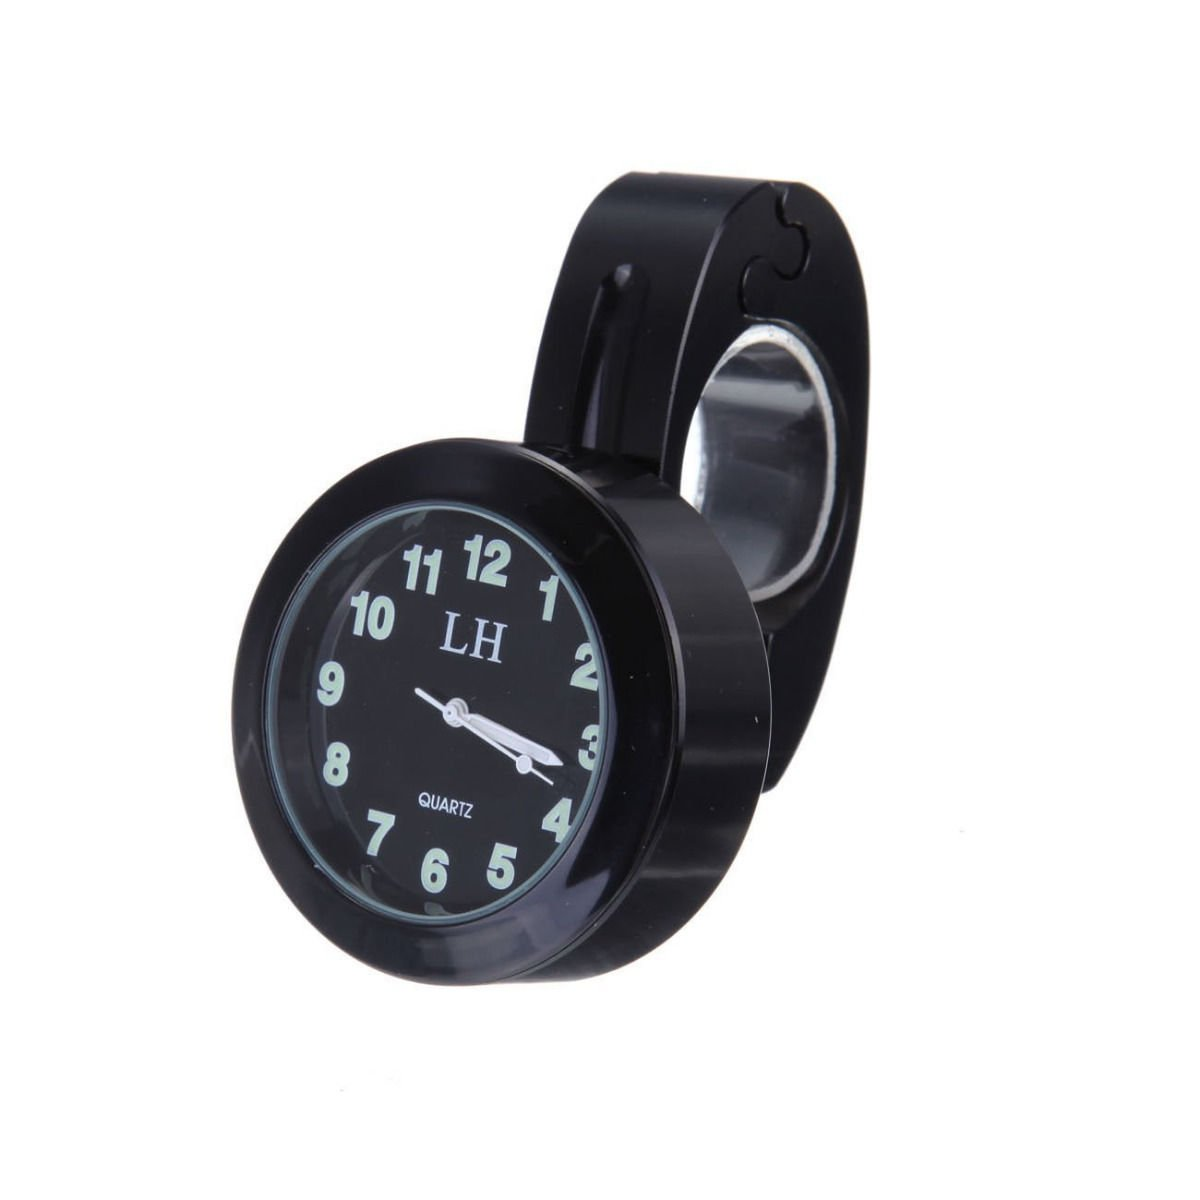 "Aunoc 7/8"" 1"" Motorcycle Handlebar Chrome Black Dial Clock For Harley Chopper Touring"